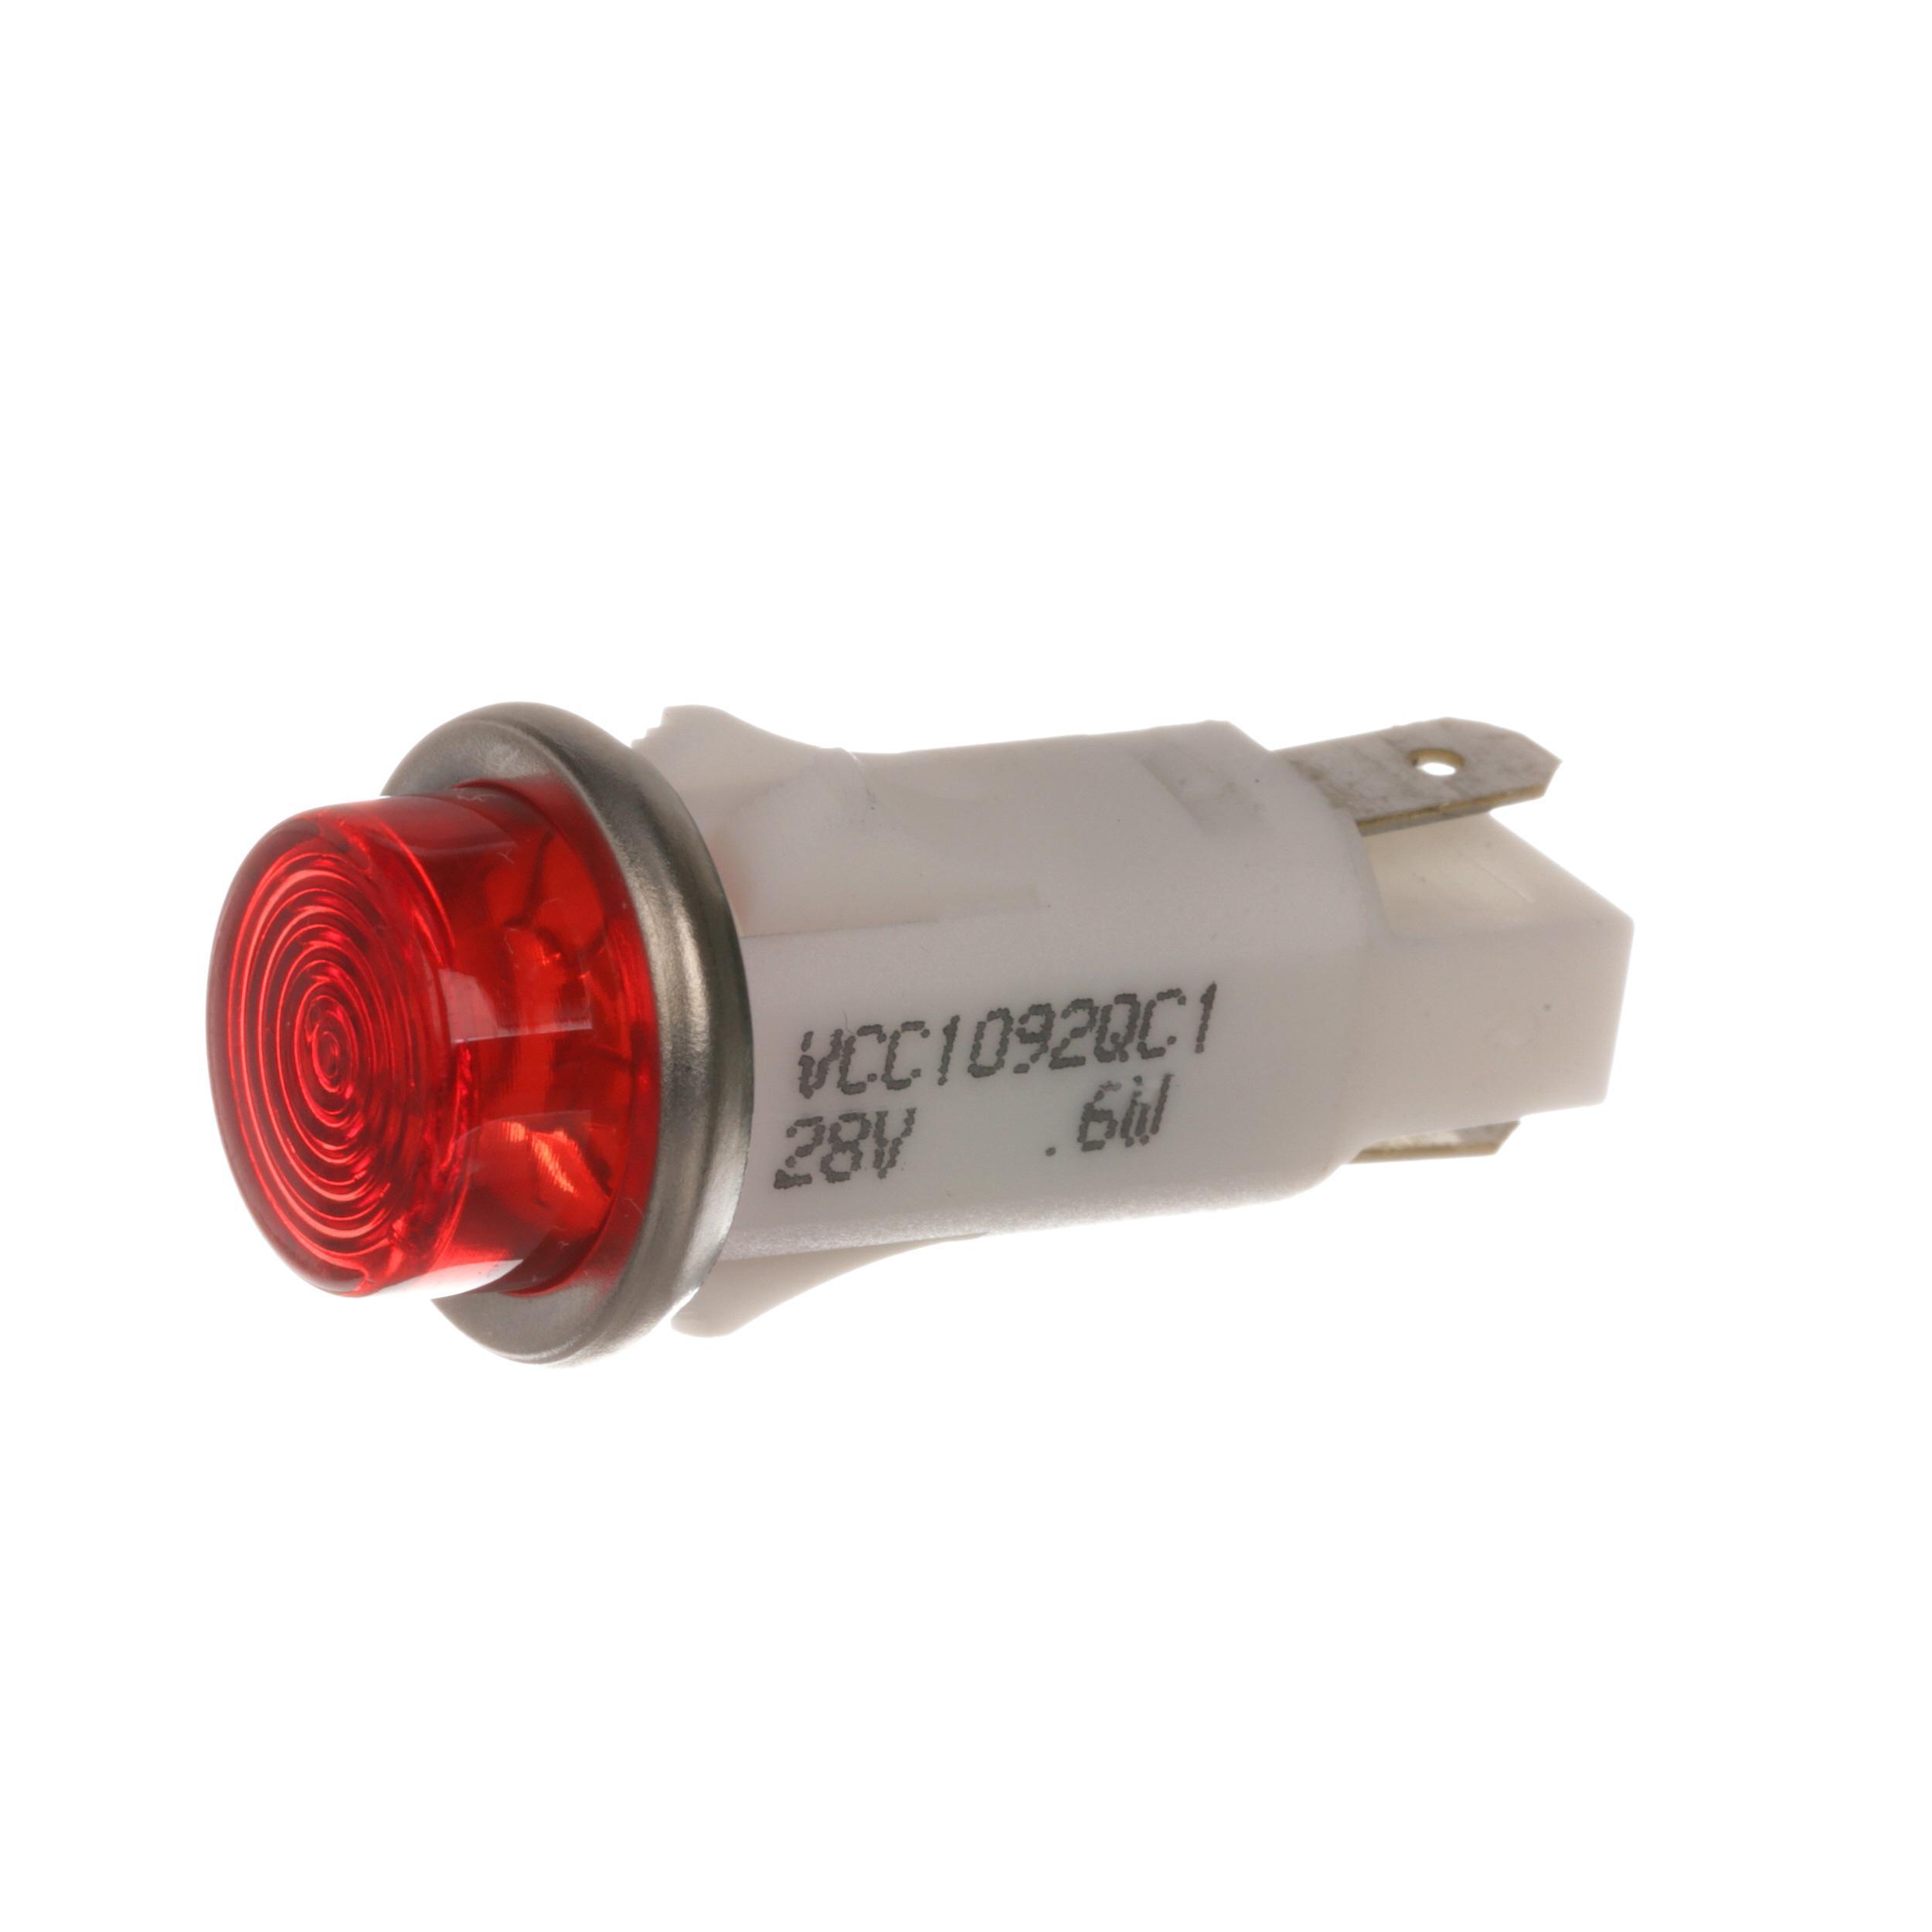 BLODGETT IND LIGHT RED 28V